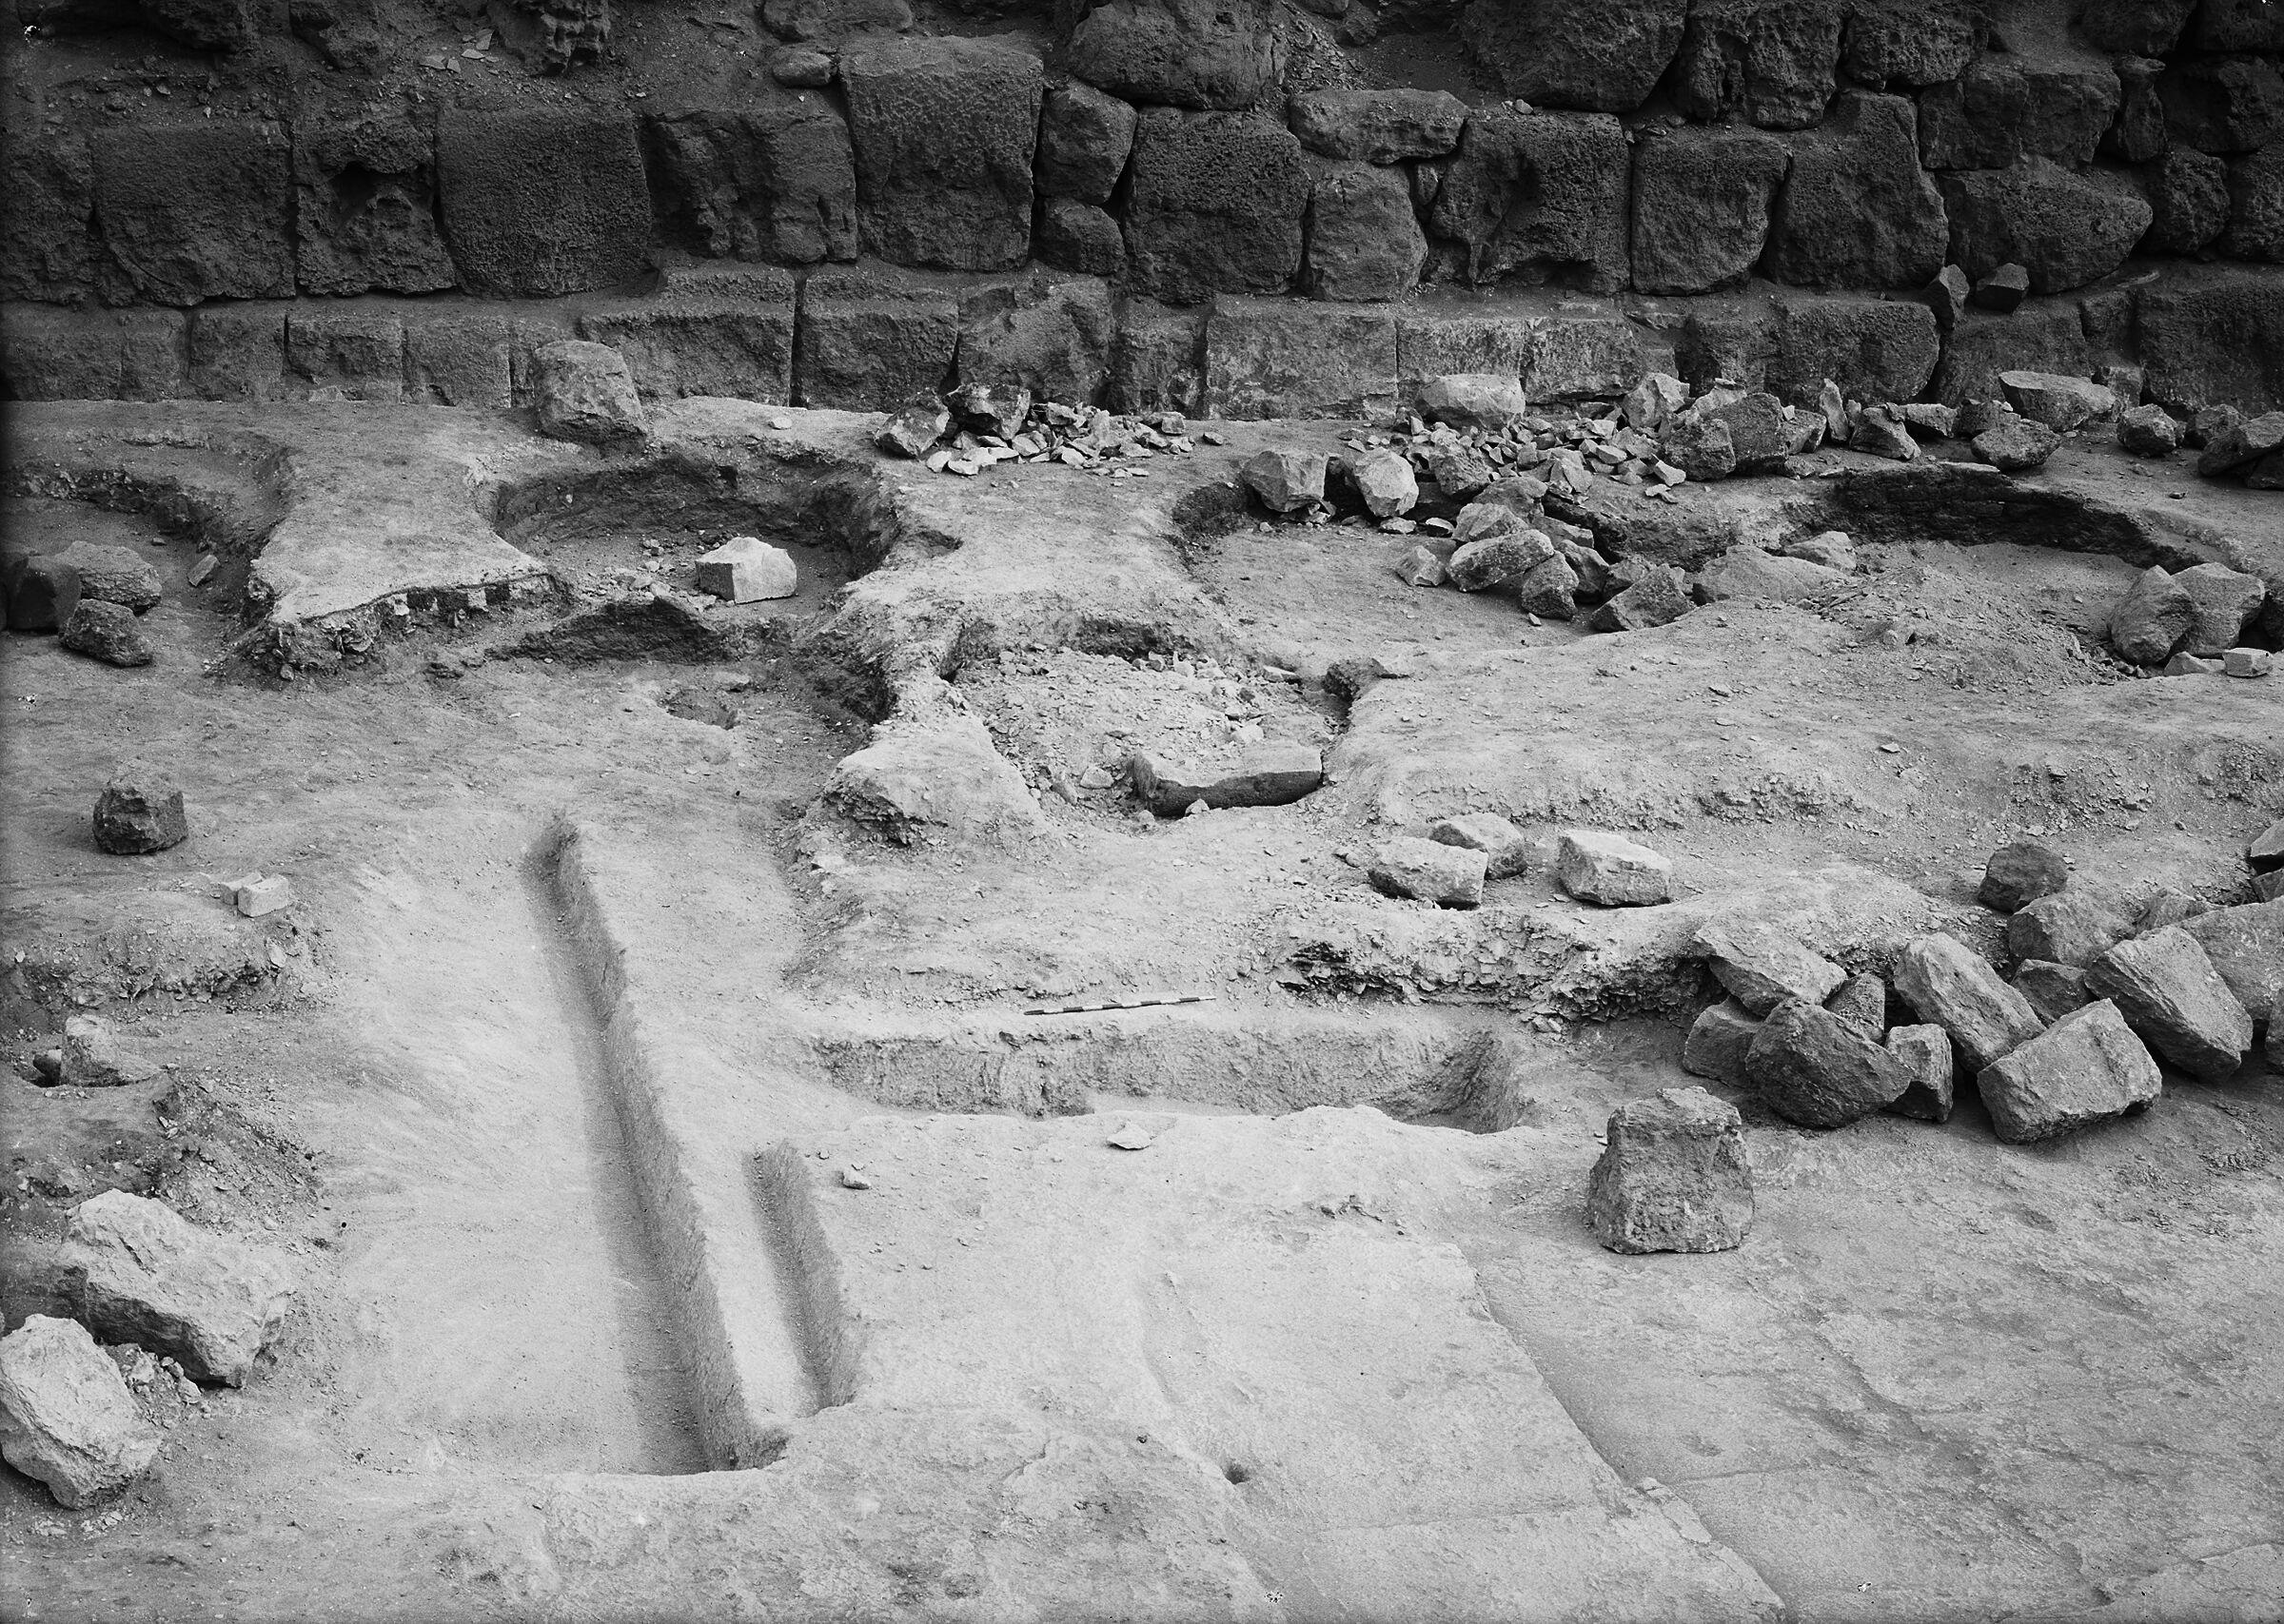 Khufu Pyramid Complex: Site: Giza; View: street G 7000, G I-a, bin 139, bin 140, bin 141, bin 142